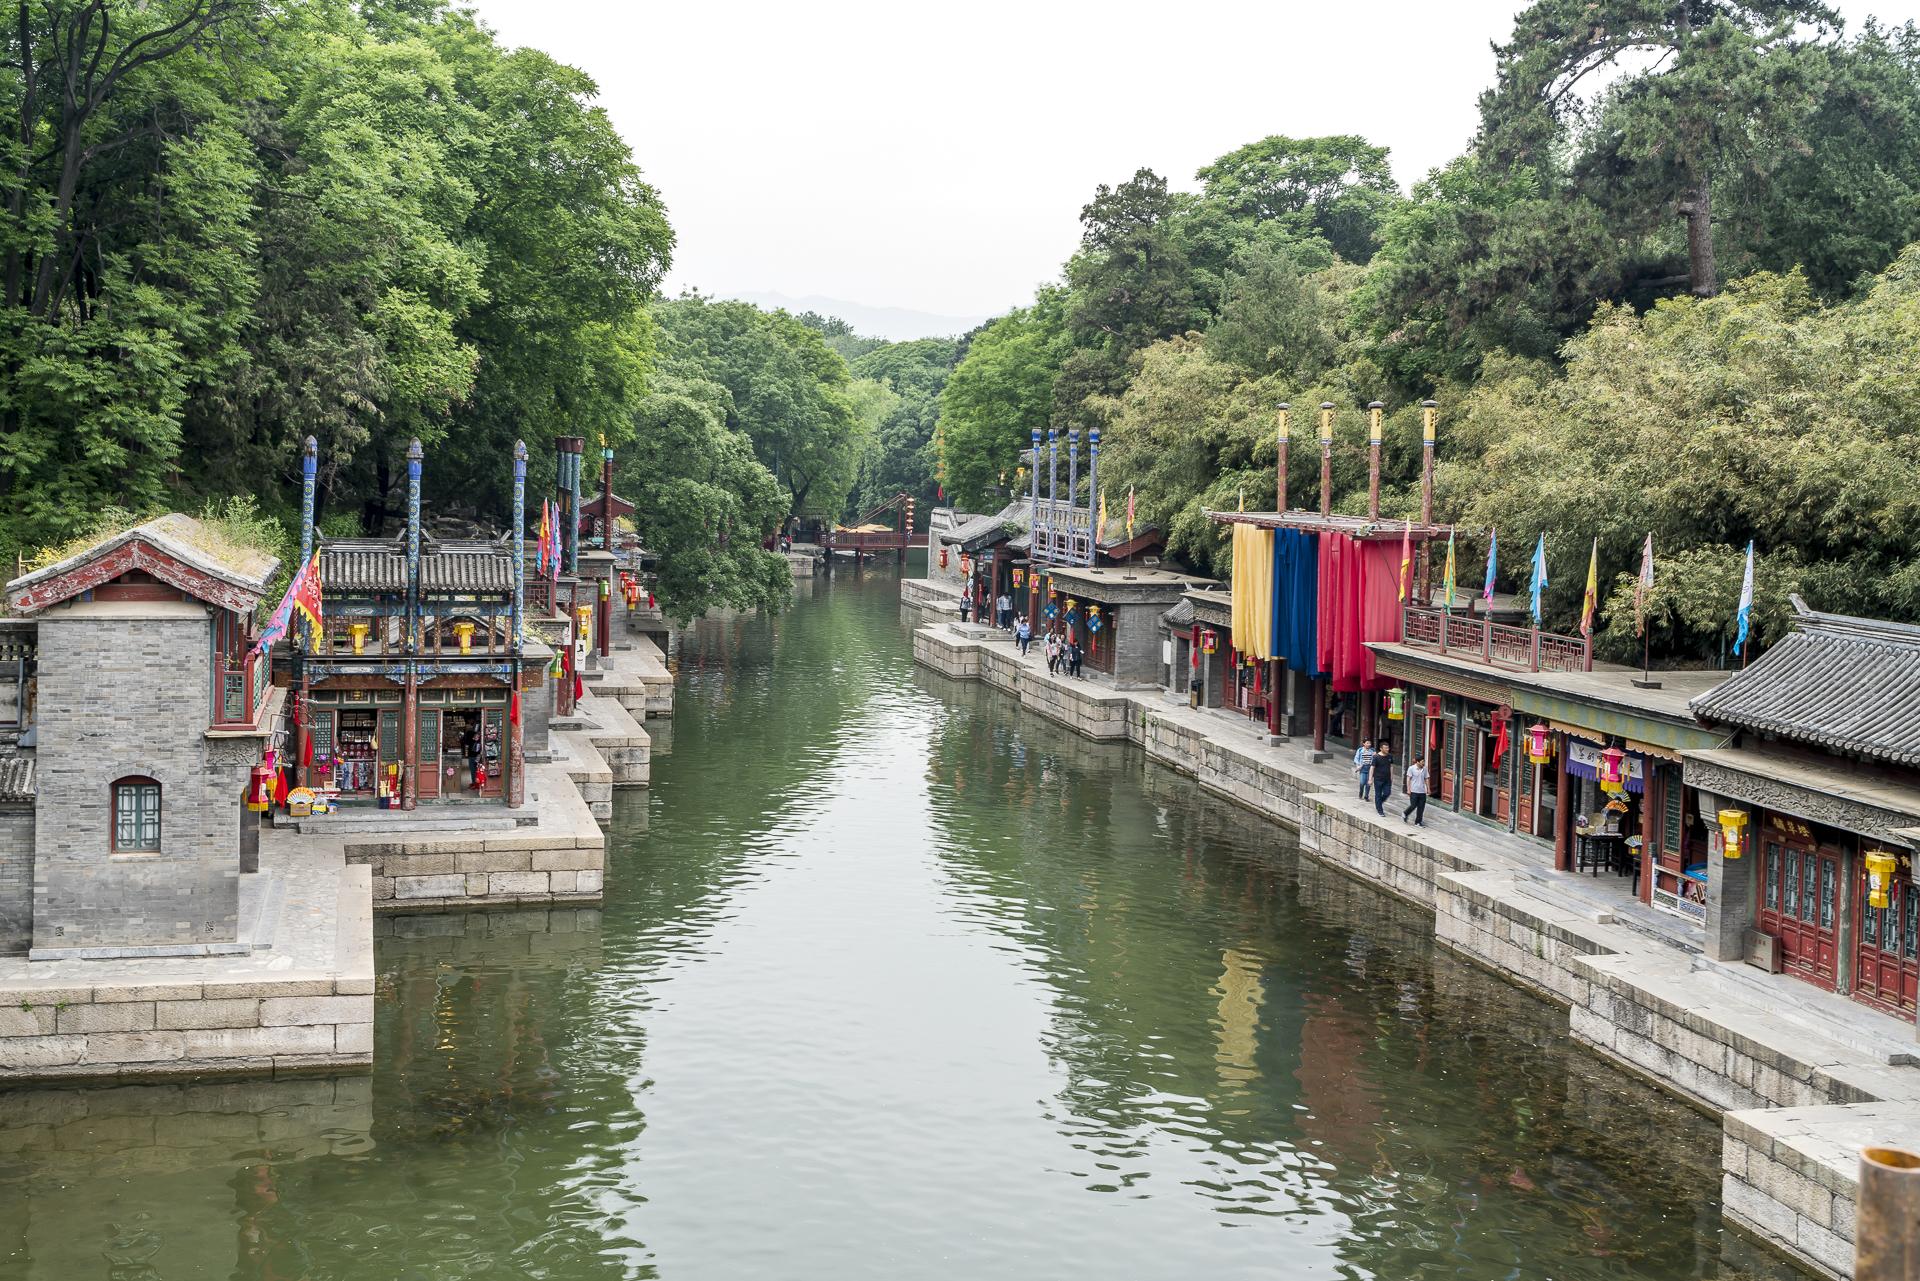 Peking Sommerpalast Kanal